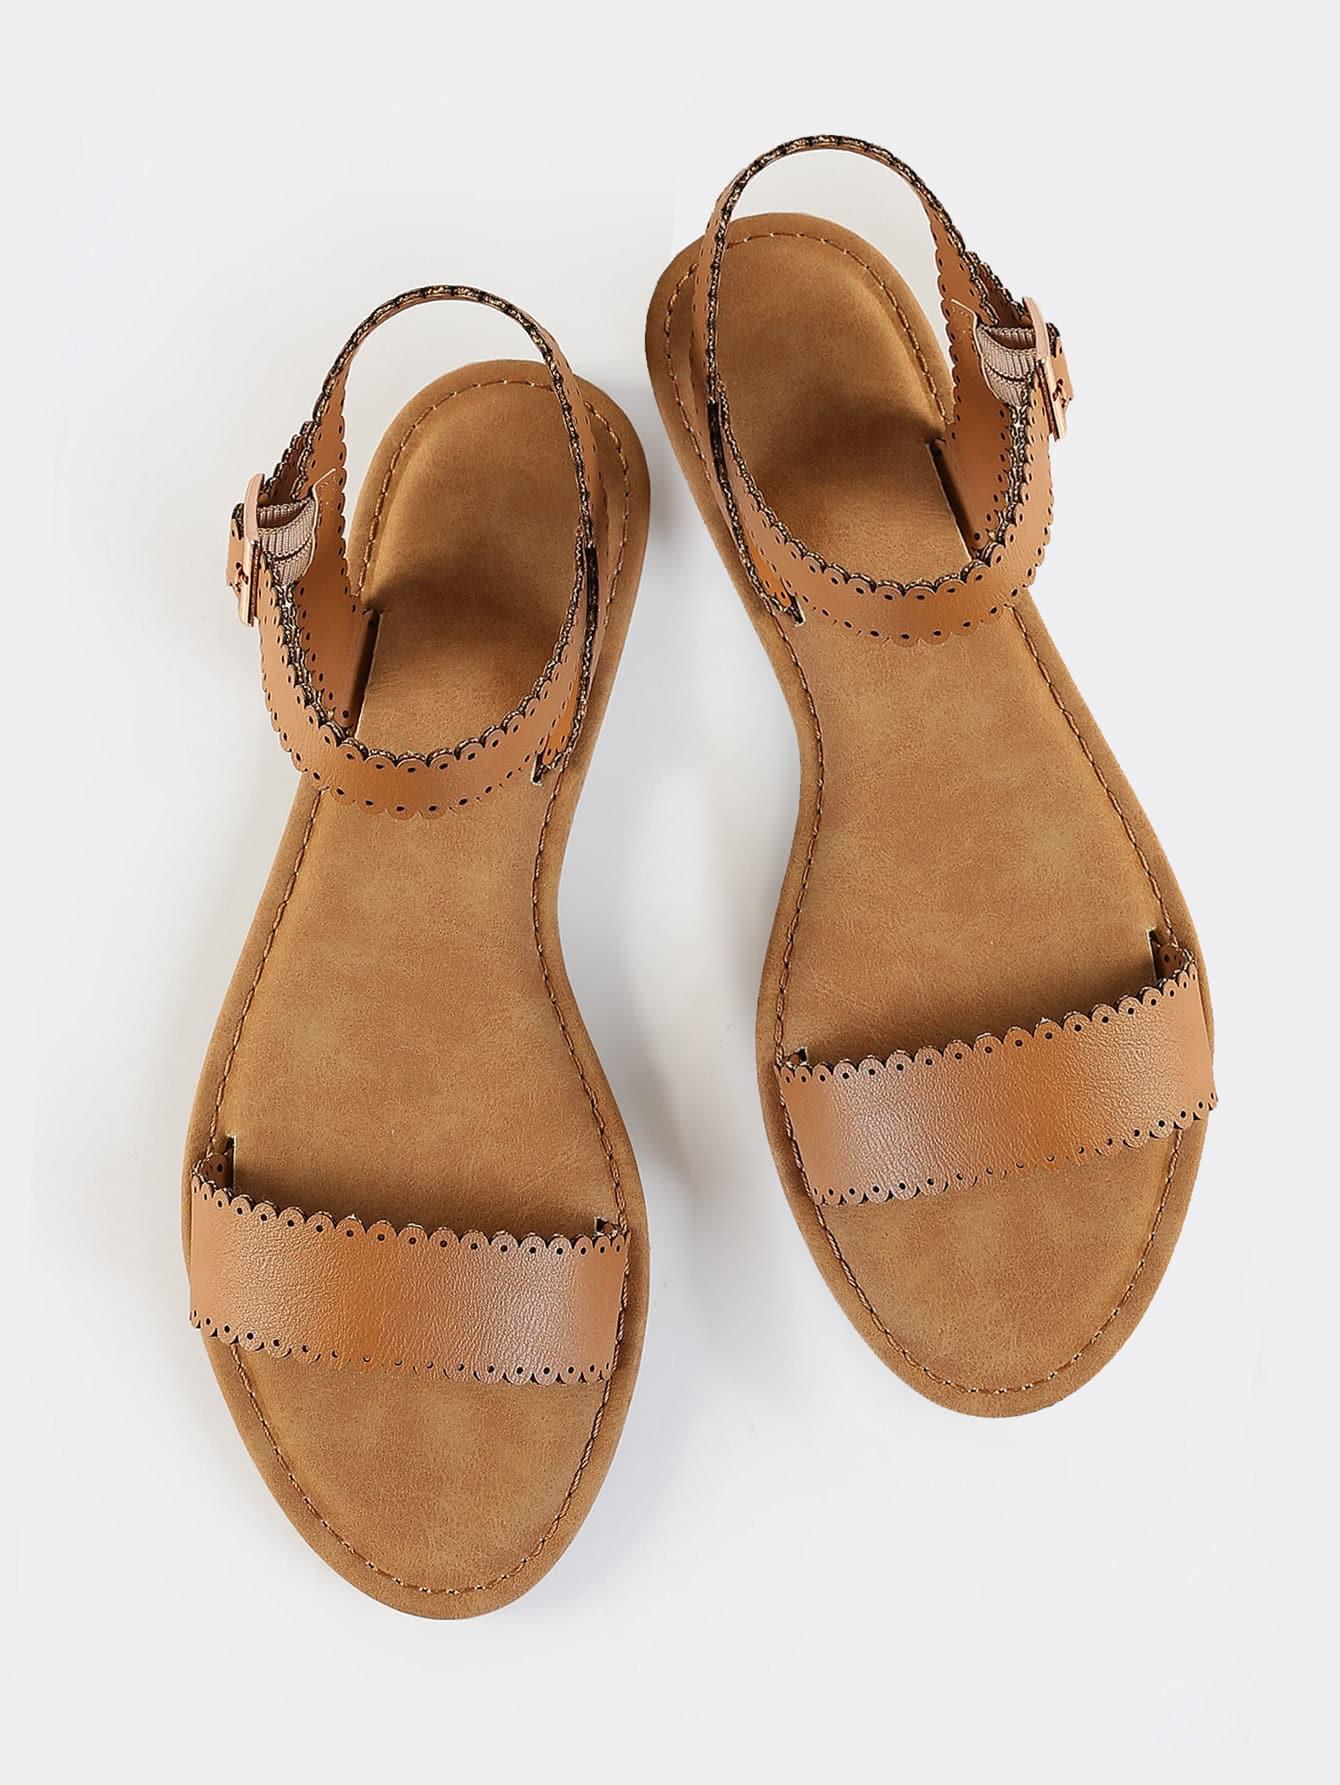 Weding Shoes Sandles 010 - Weding Shoes Sandles